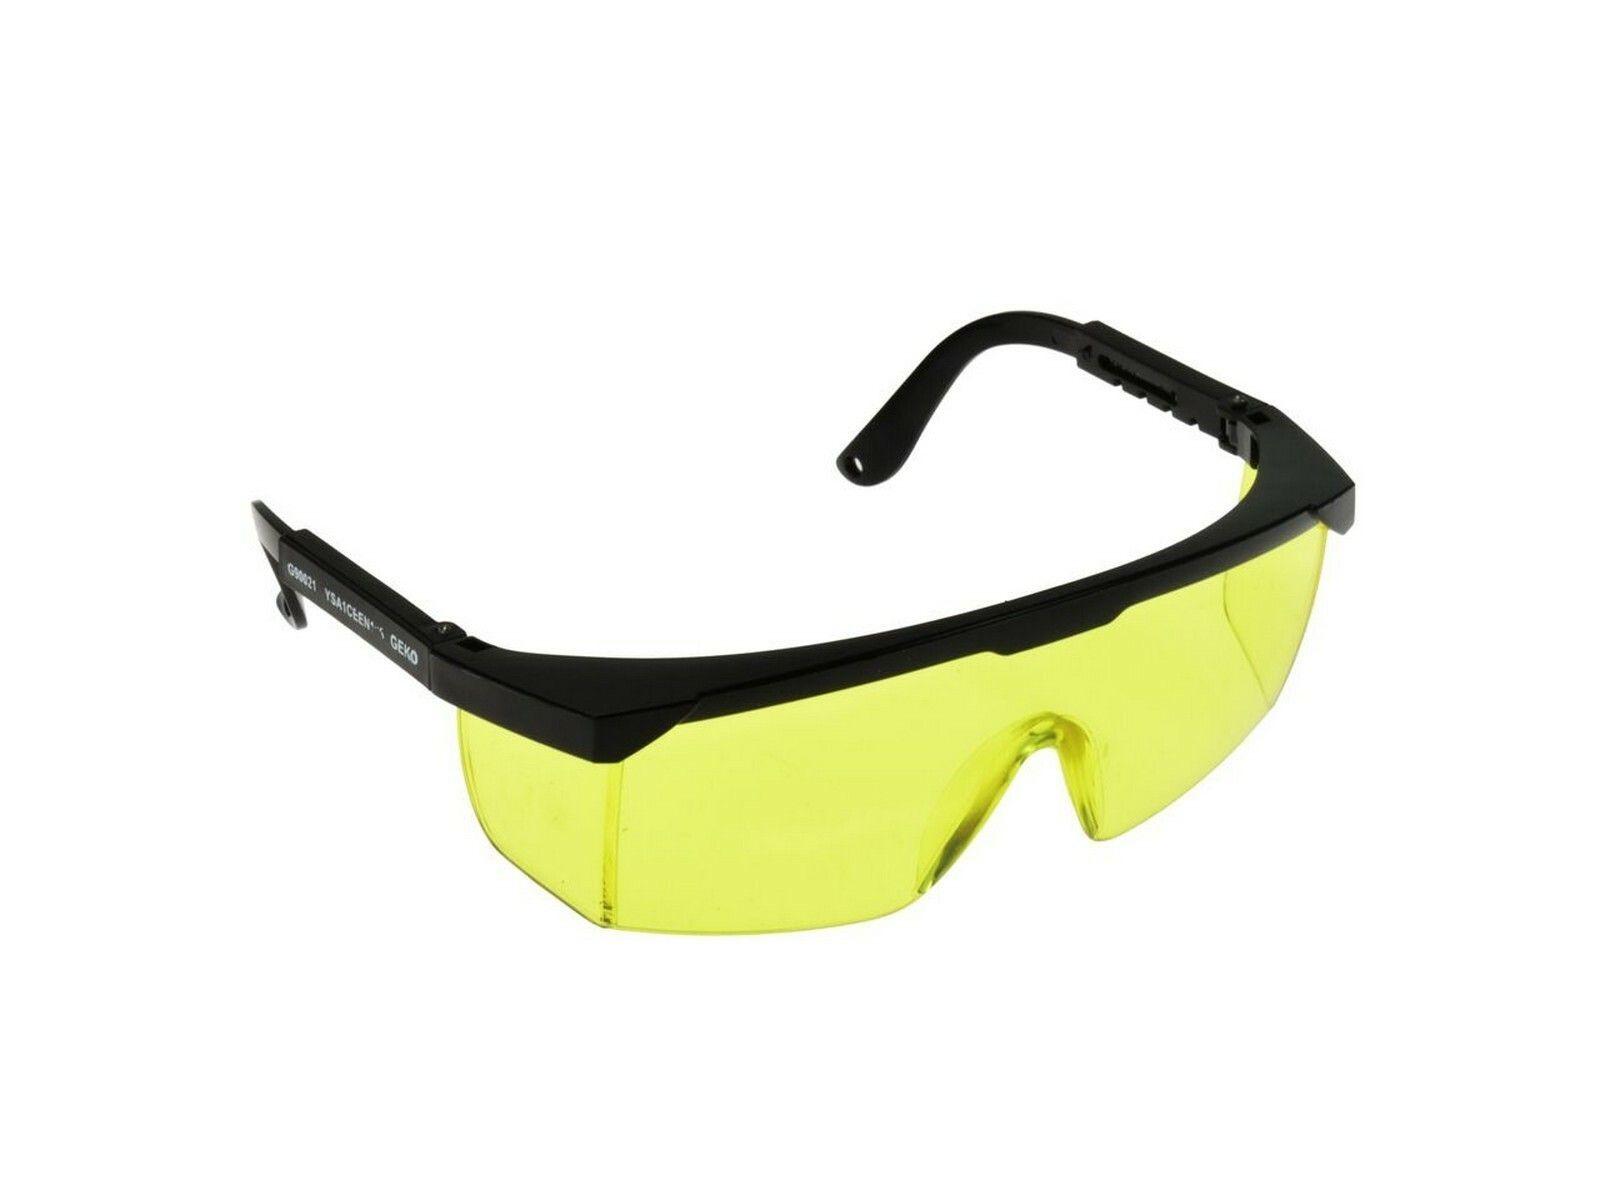 Žluté ochranné brýle GEKO